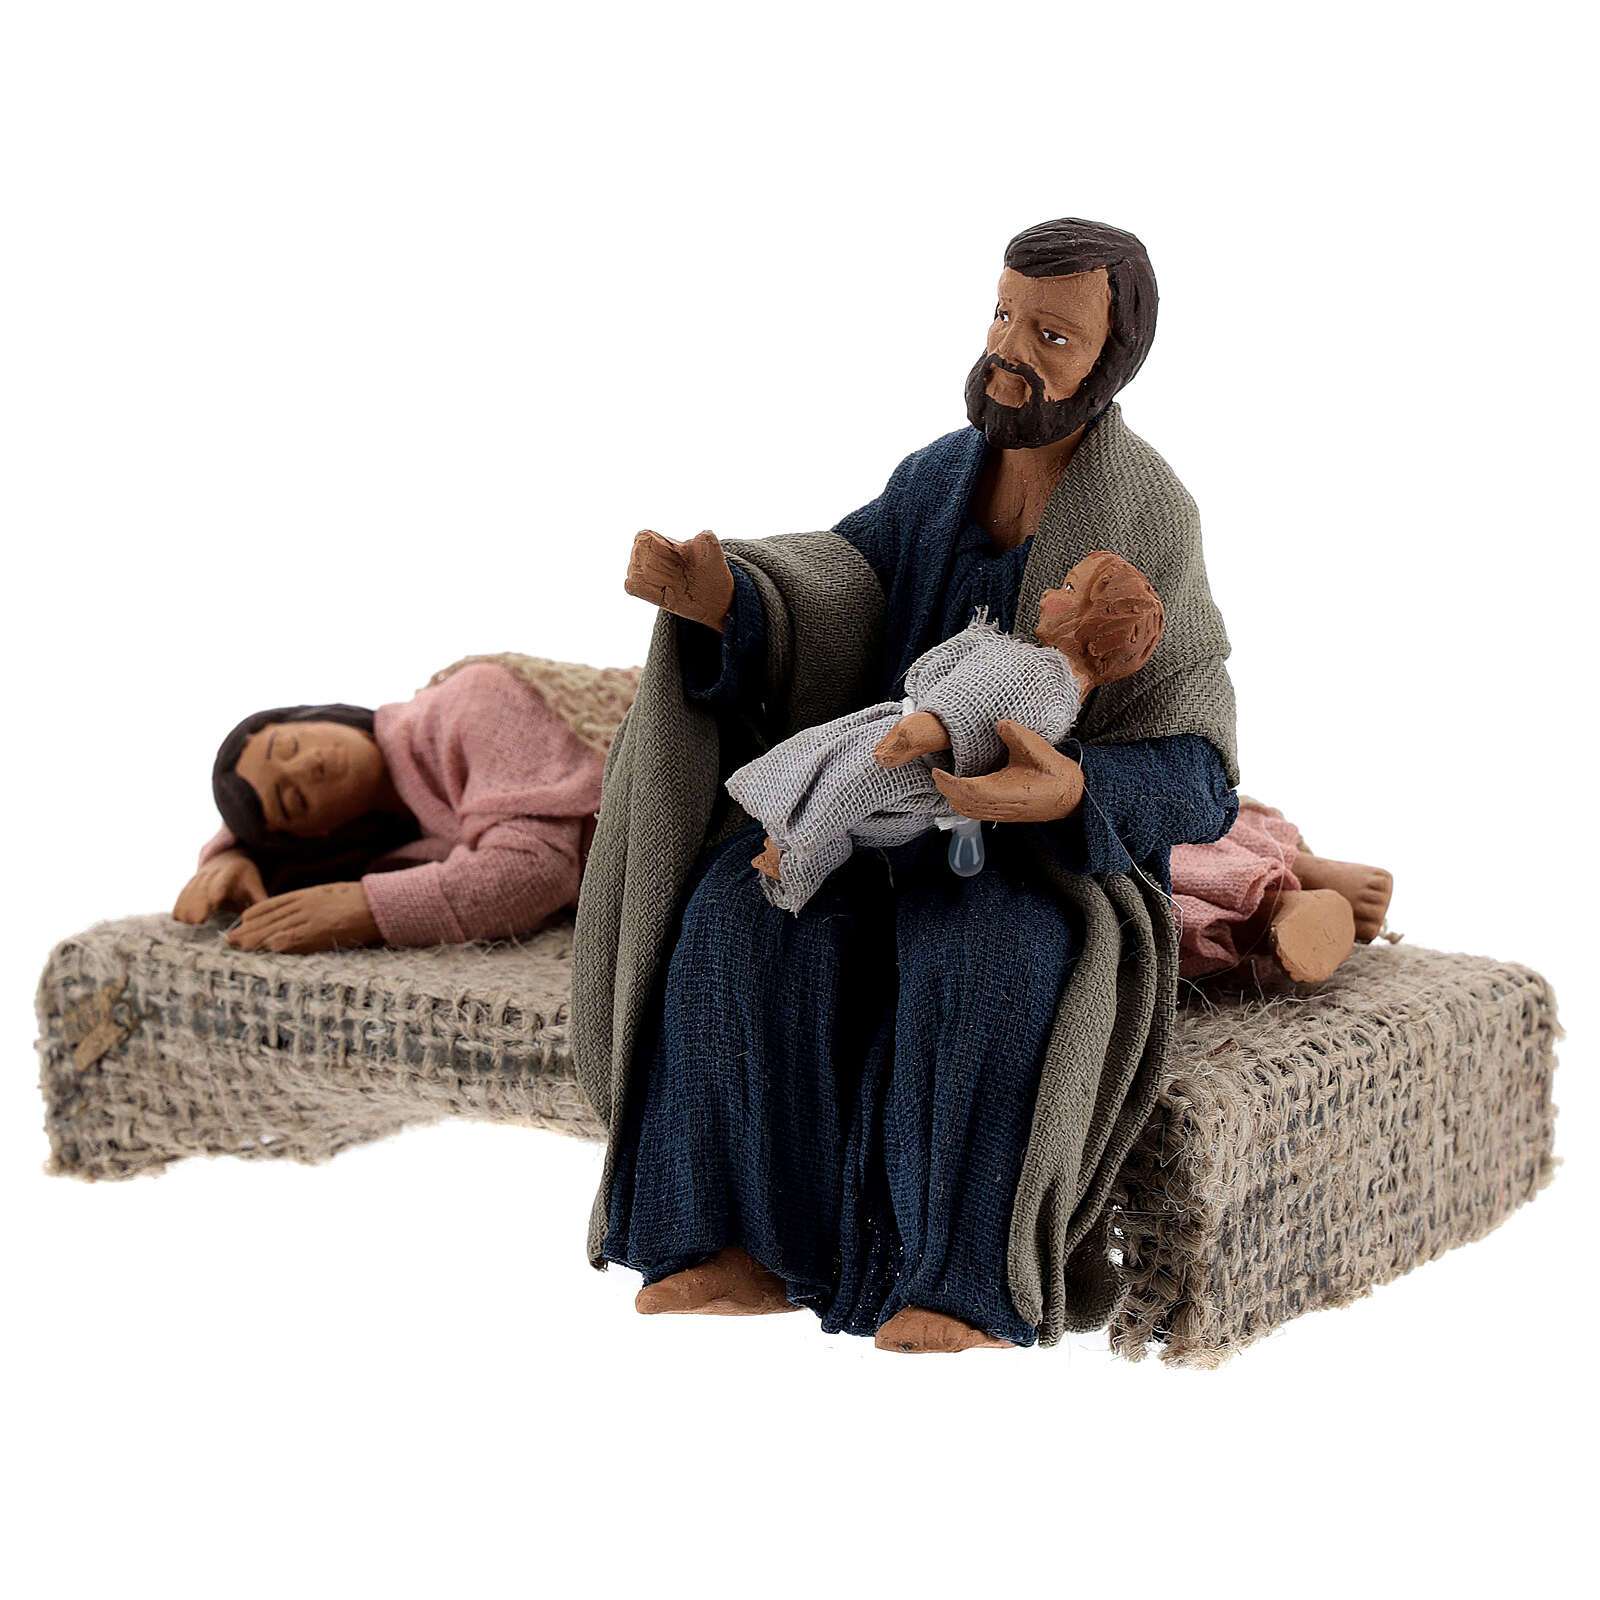 Holy Family sleeping Mary figurine, 13 cm Neapolitan nativity 4